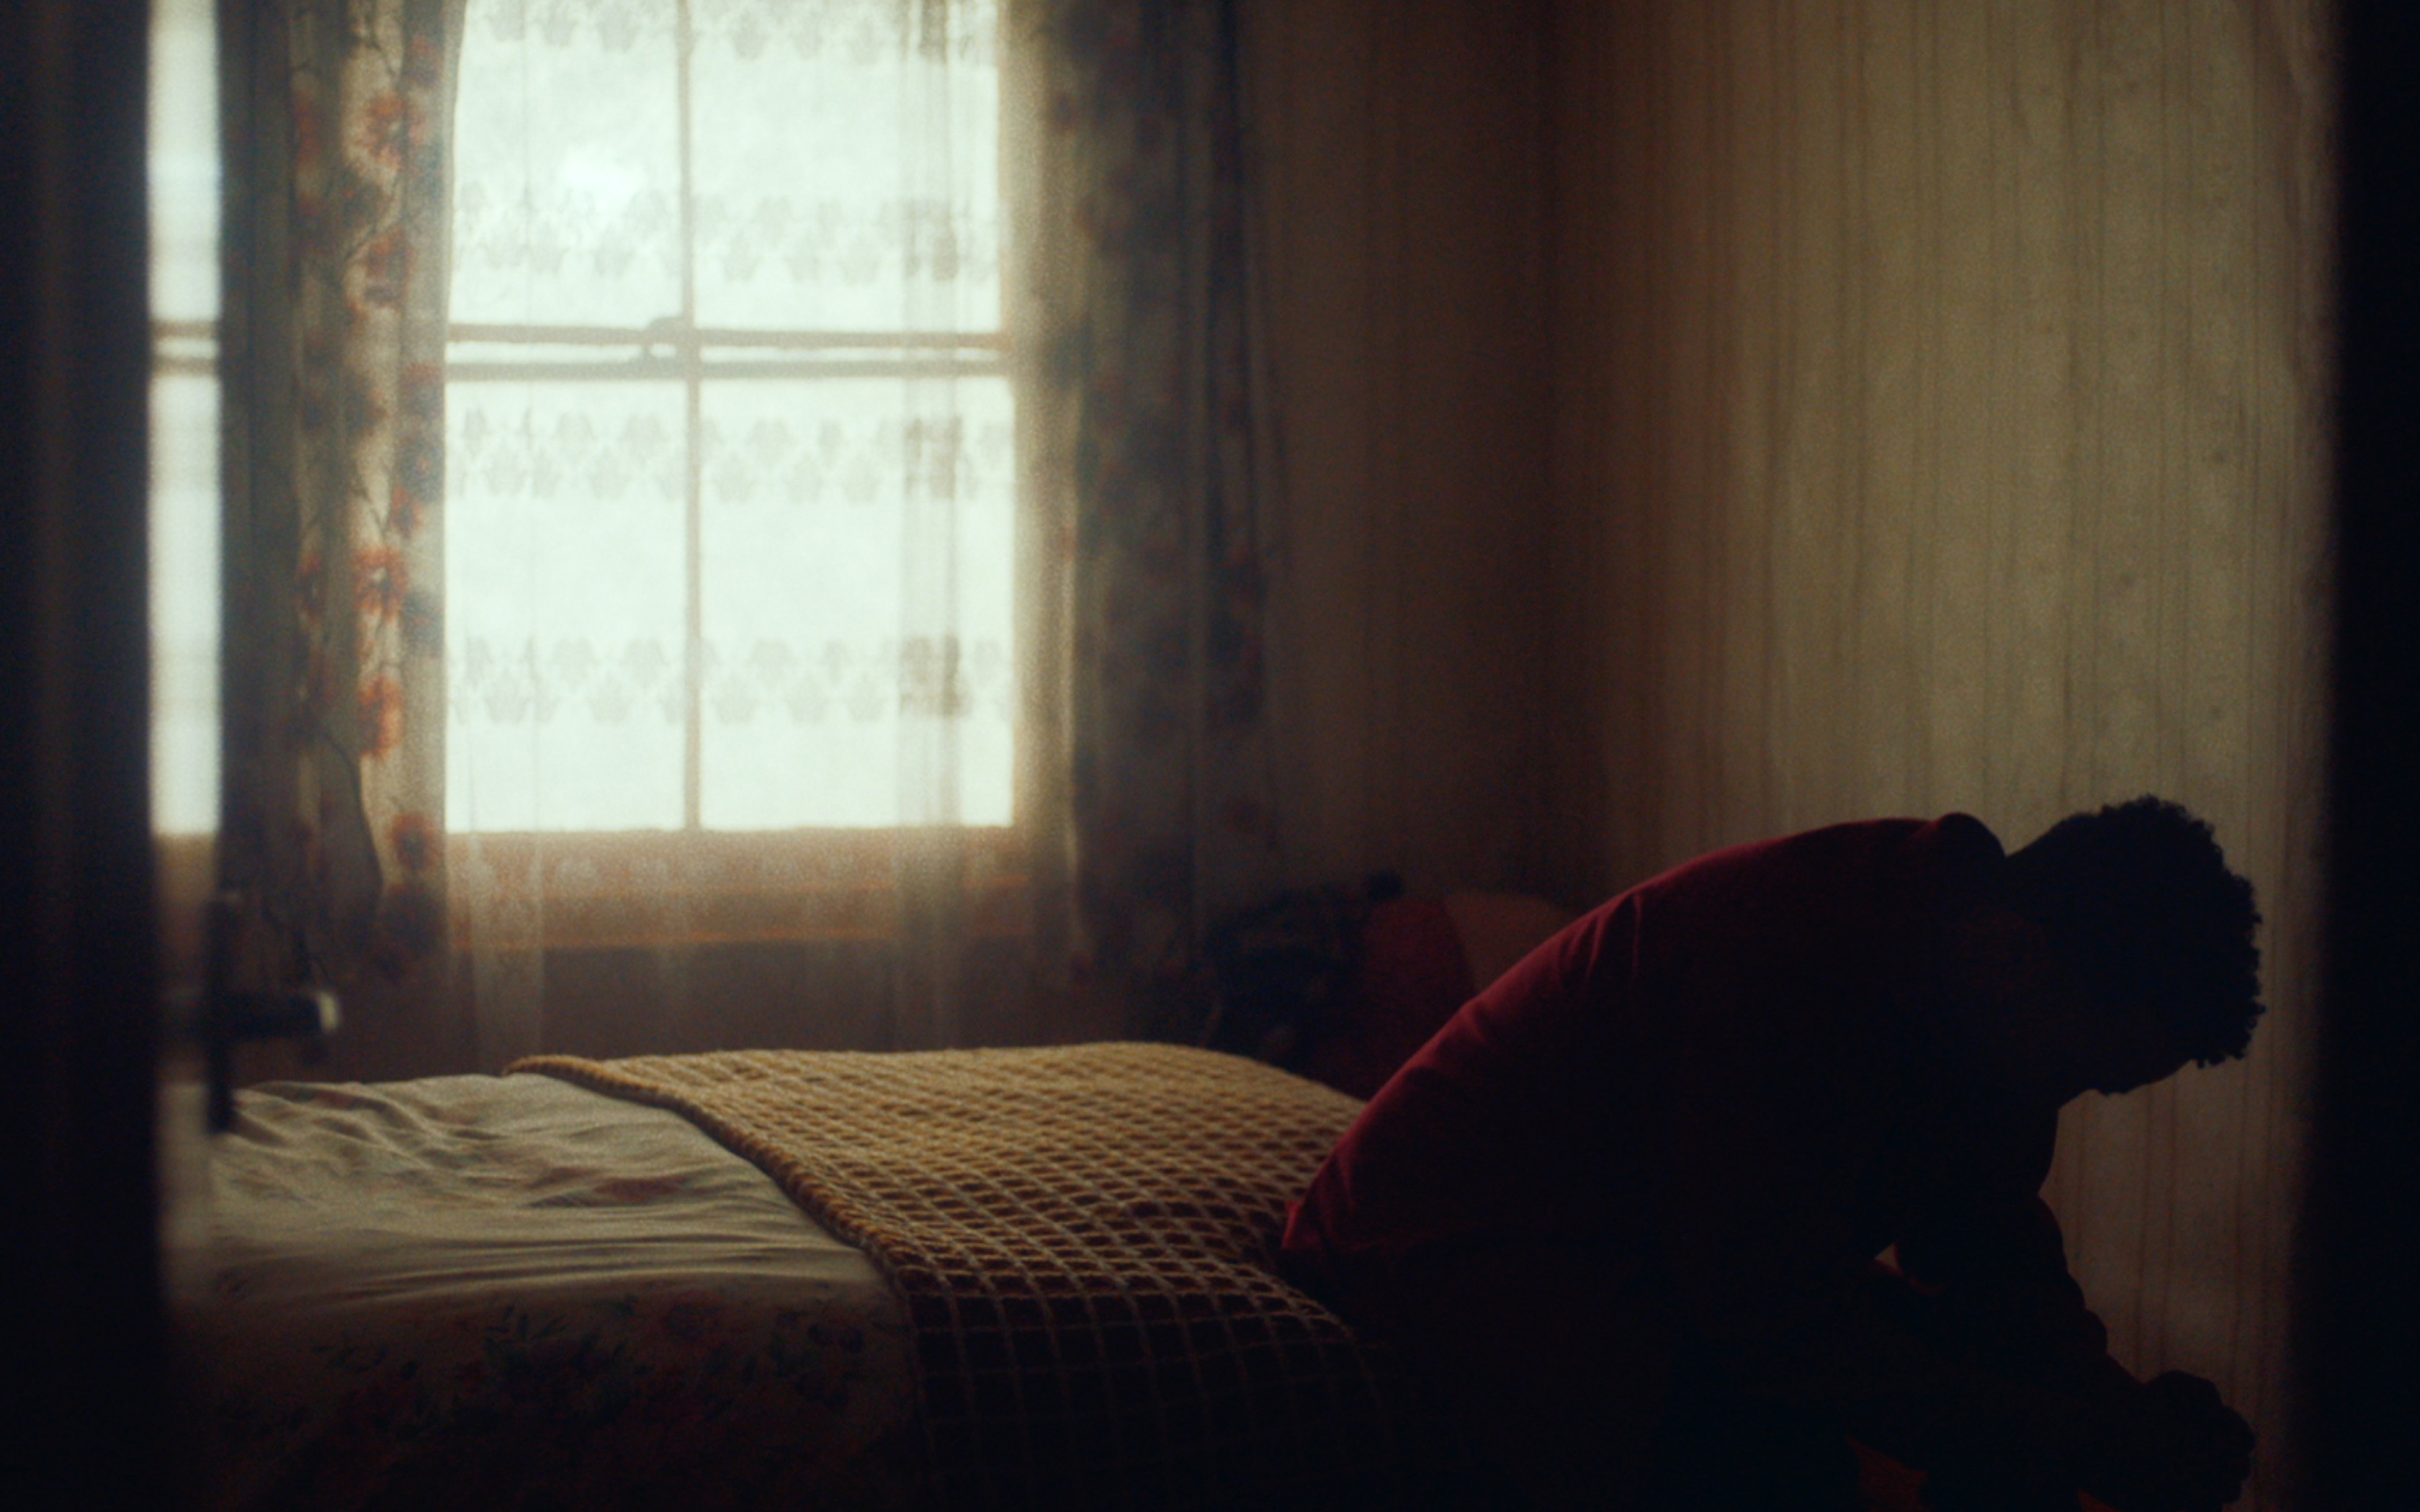 Shaun James Grant - Maverick Sabre - Her Grace